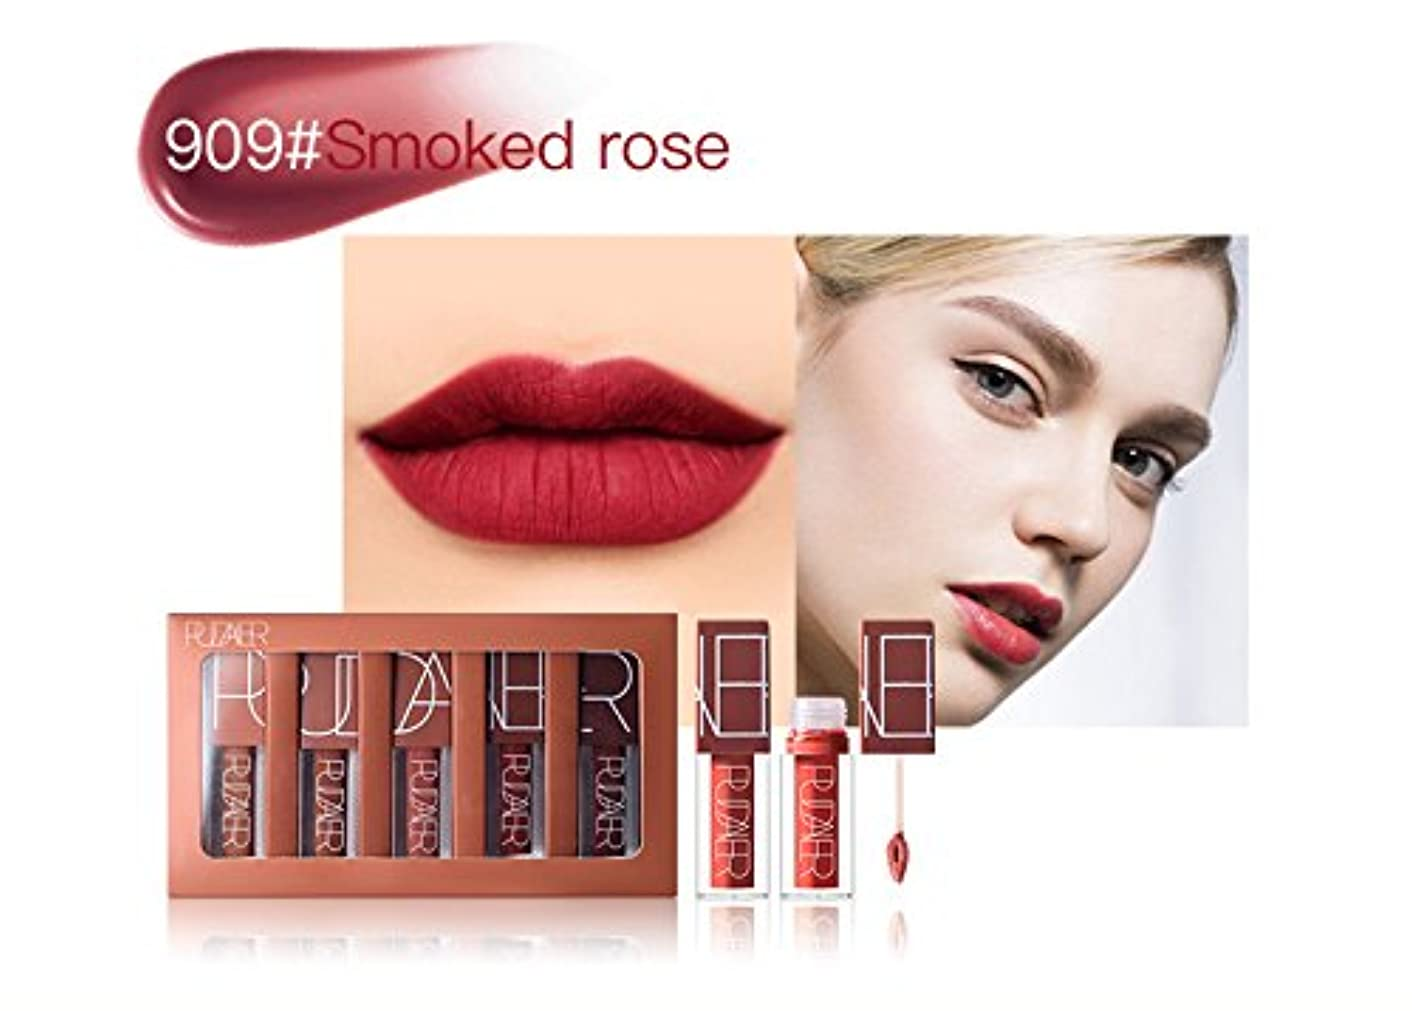 No #909 Hot Brand Long Lasting Velvet Lips Tint Liquid Lipstick Matte Beauty Cosmetics Sexy Nude Pigment Matte Lip Gloss Tattoo Makeup